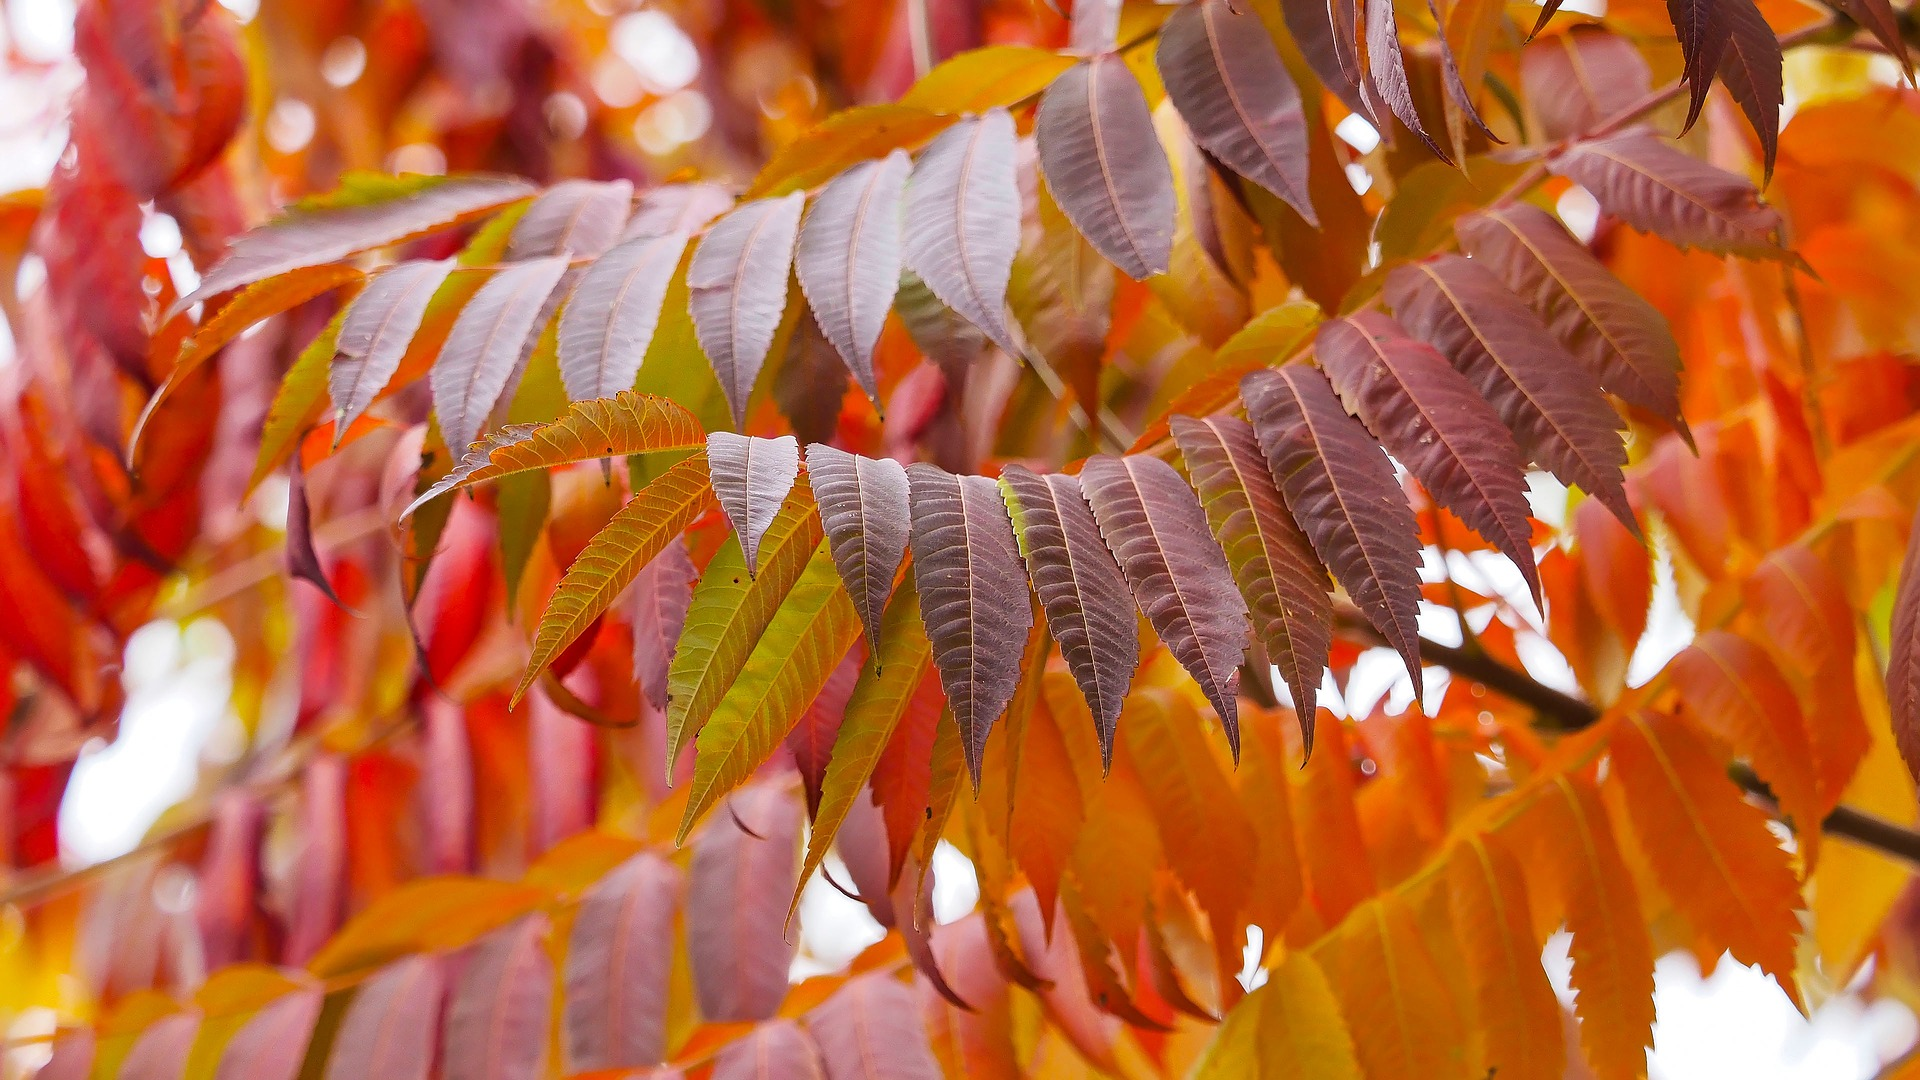 Staghorn sumac leaves